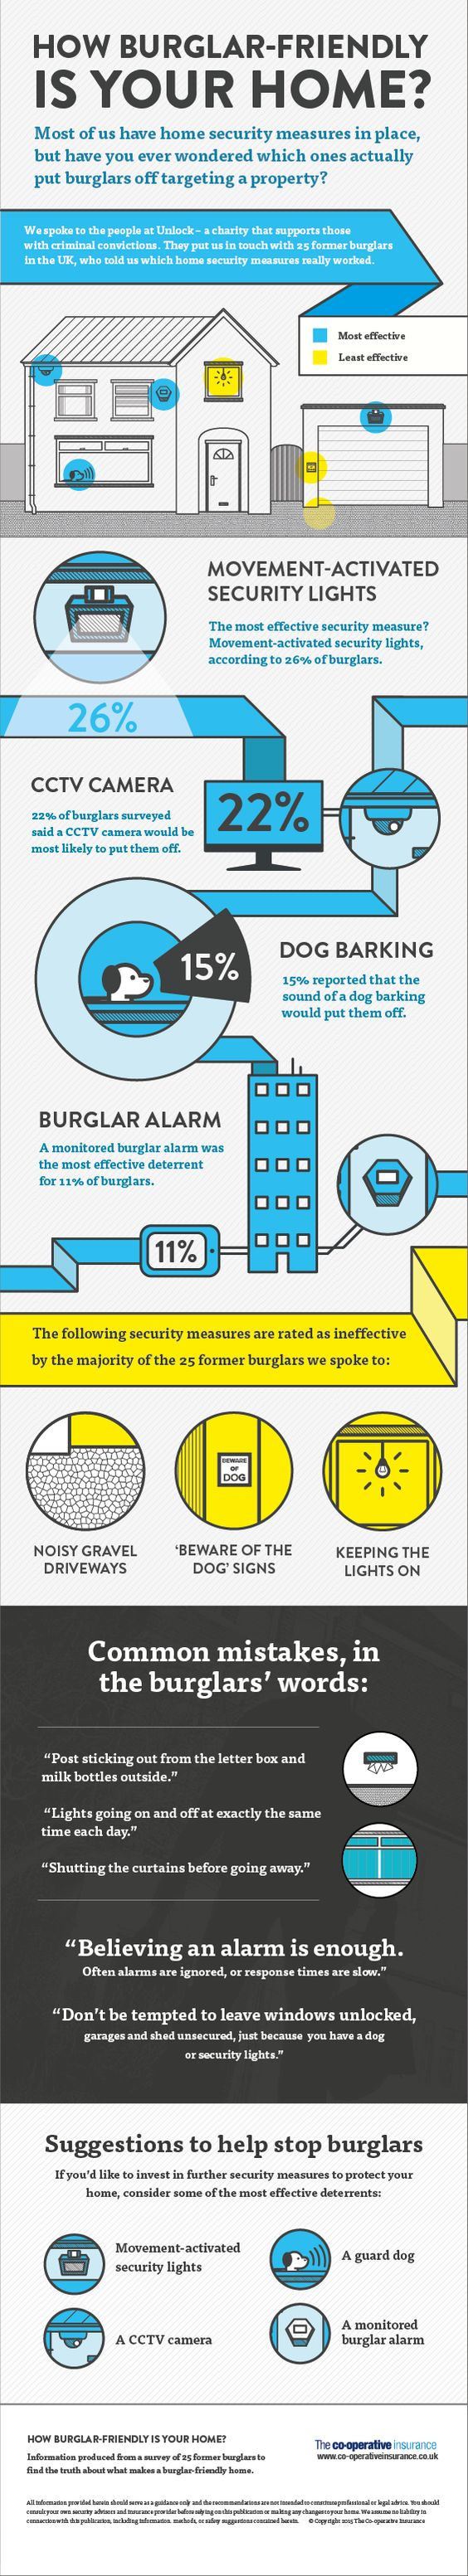 These Common Security Measures Actually Attract Burglars - Your Home's Likelihood of Burglary